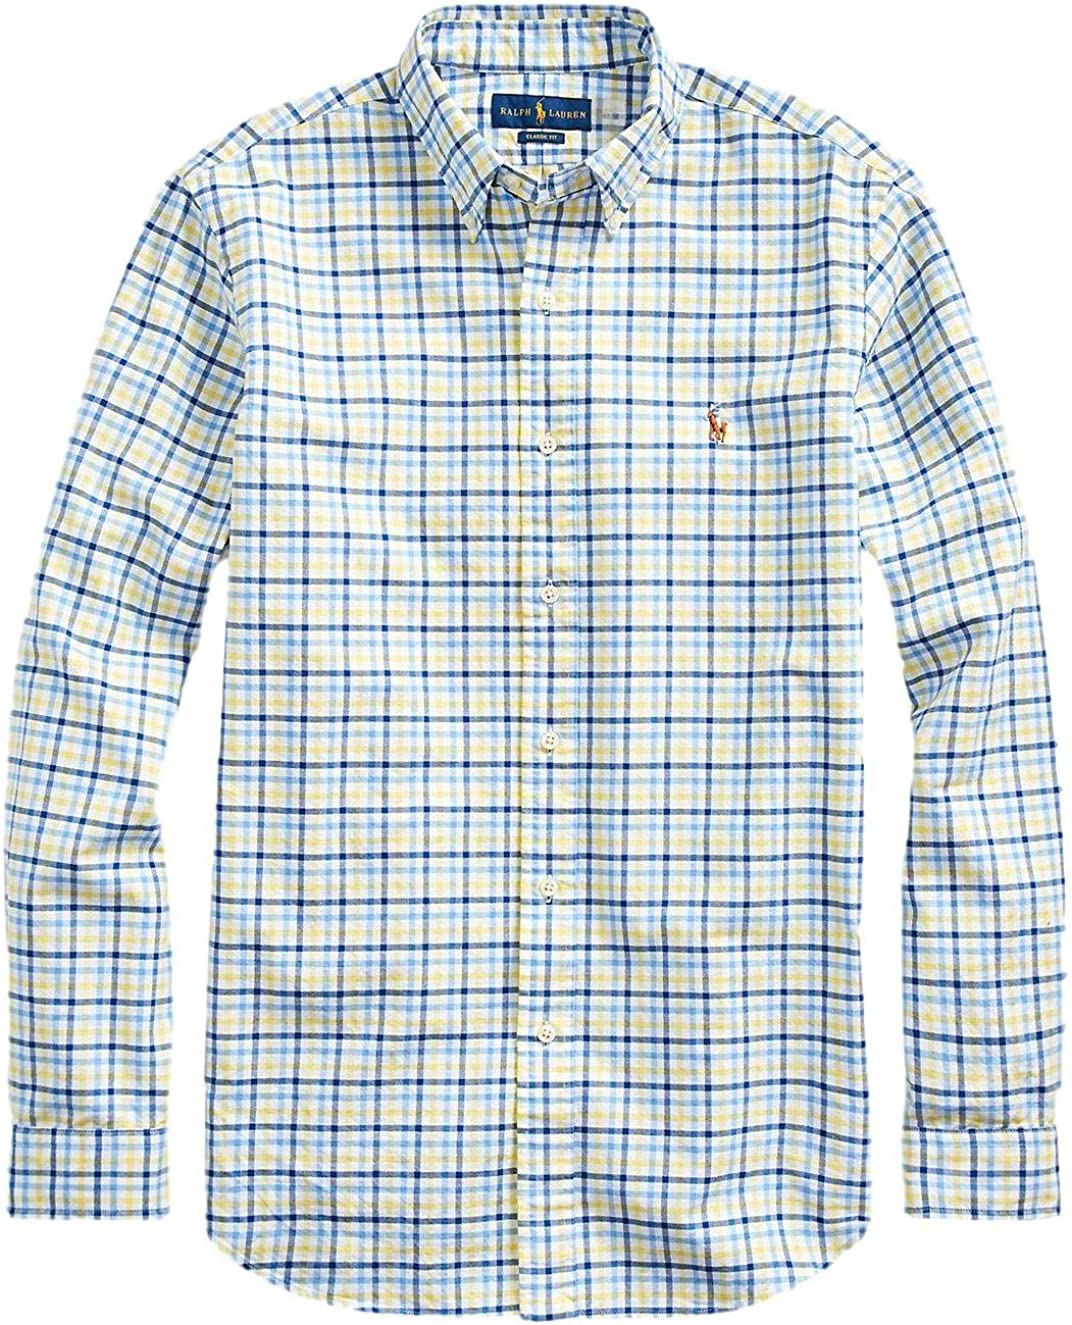 Polo Ralph Lauren Classic Fit Oxford Shirt Yellow/Navy Multi 2XL